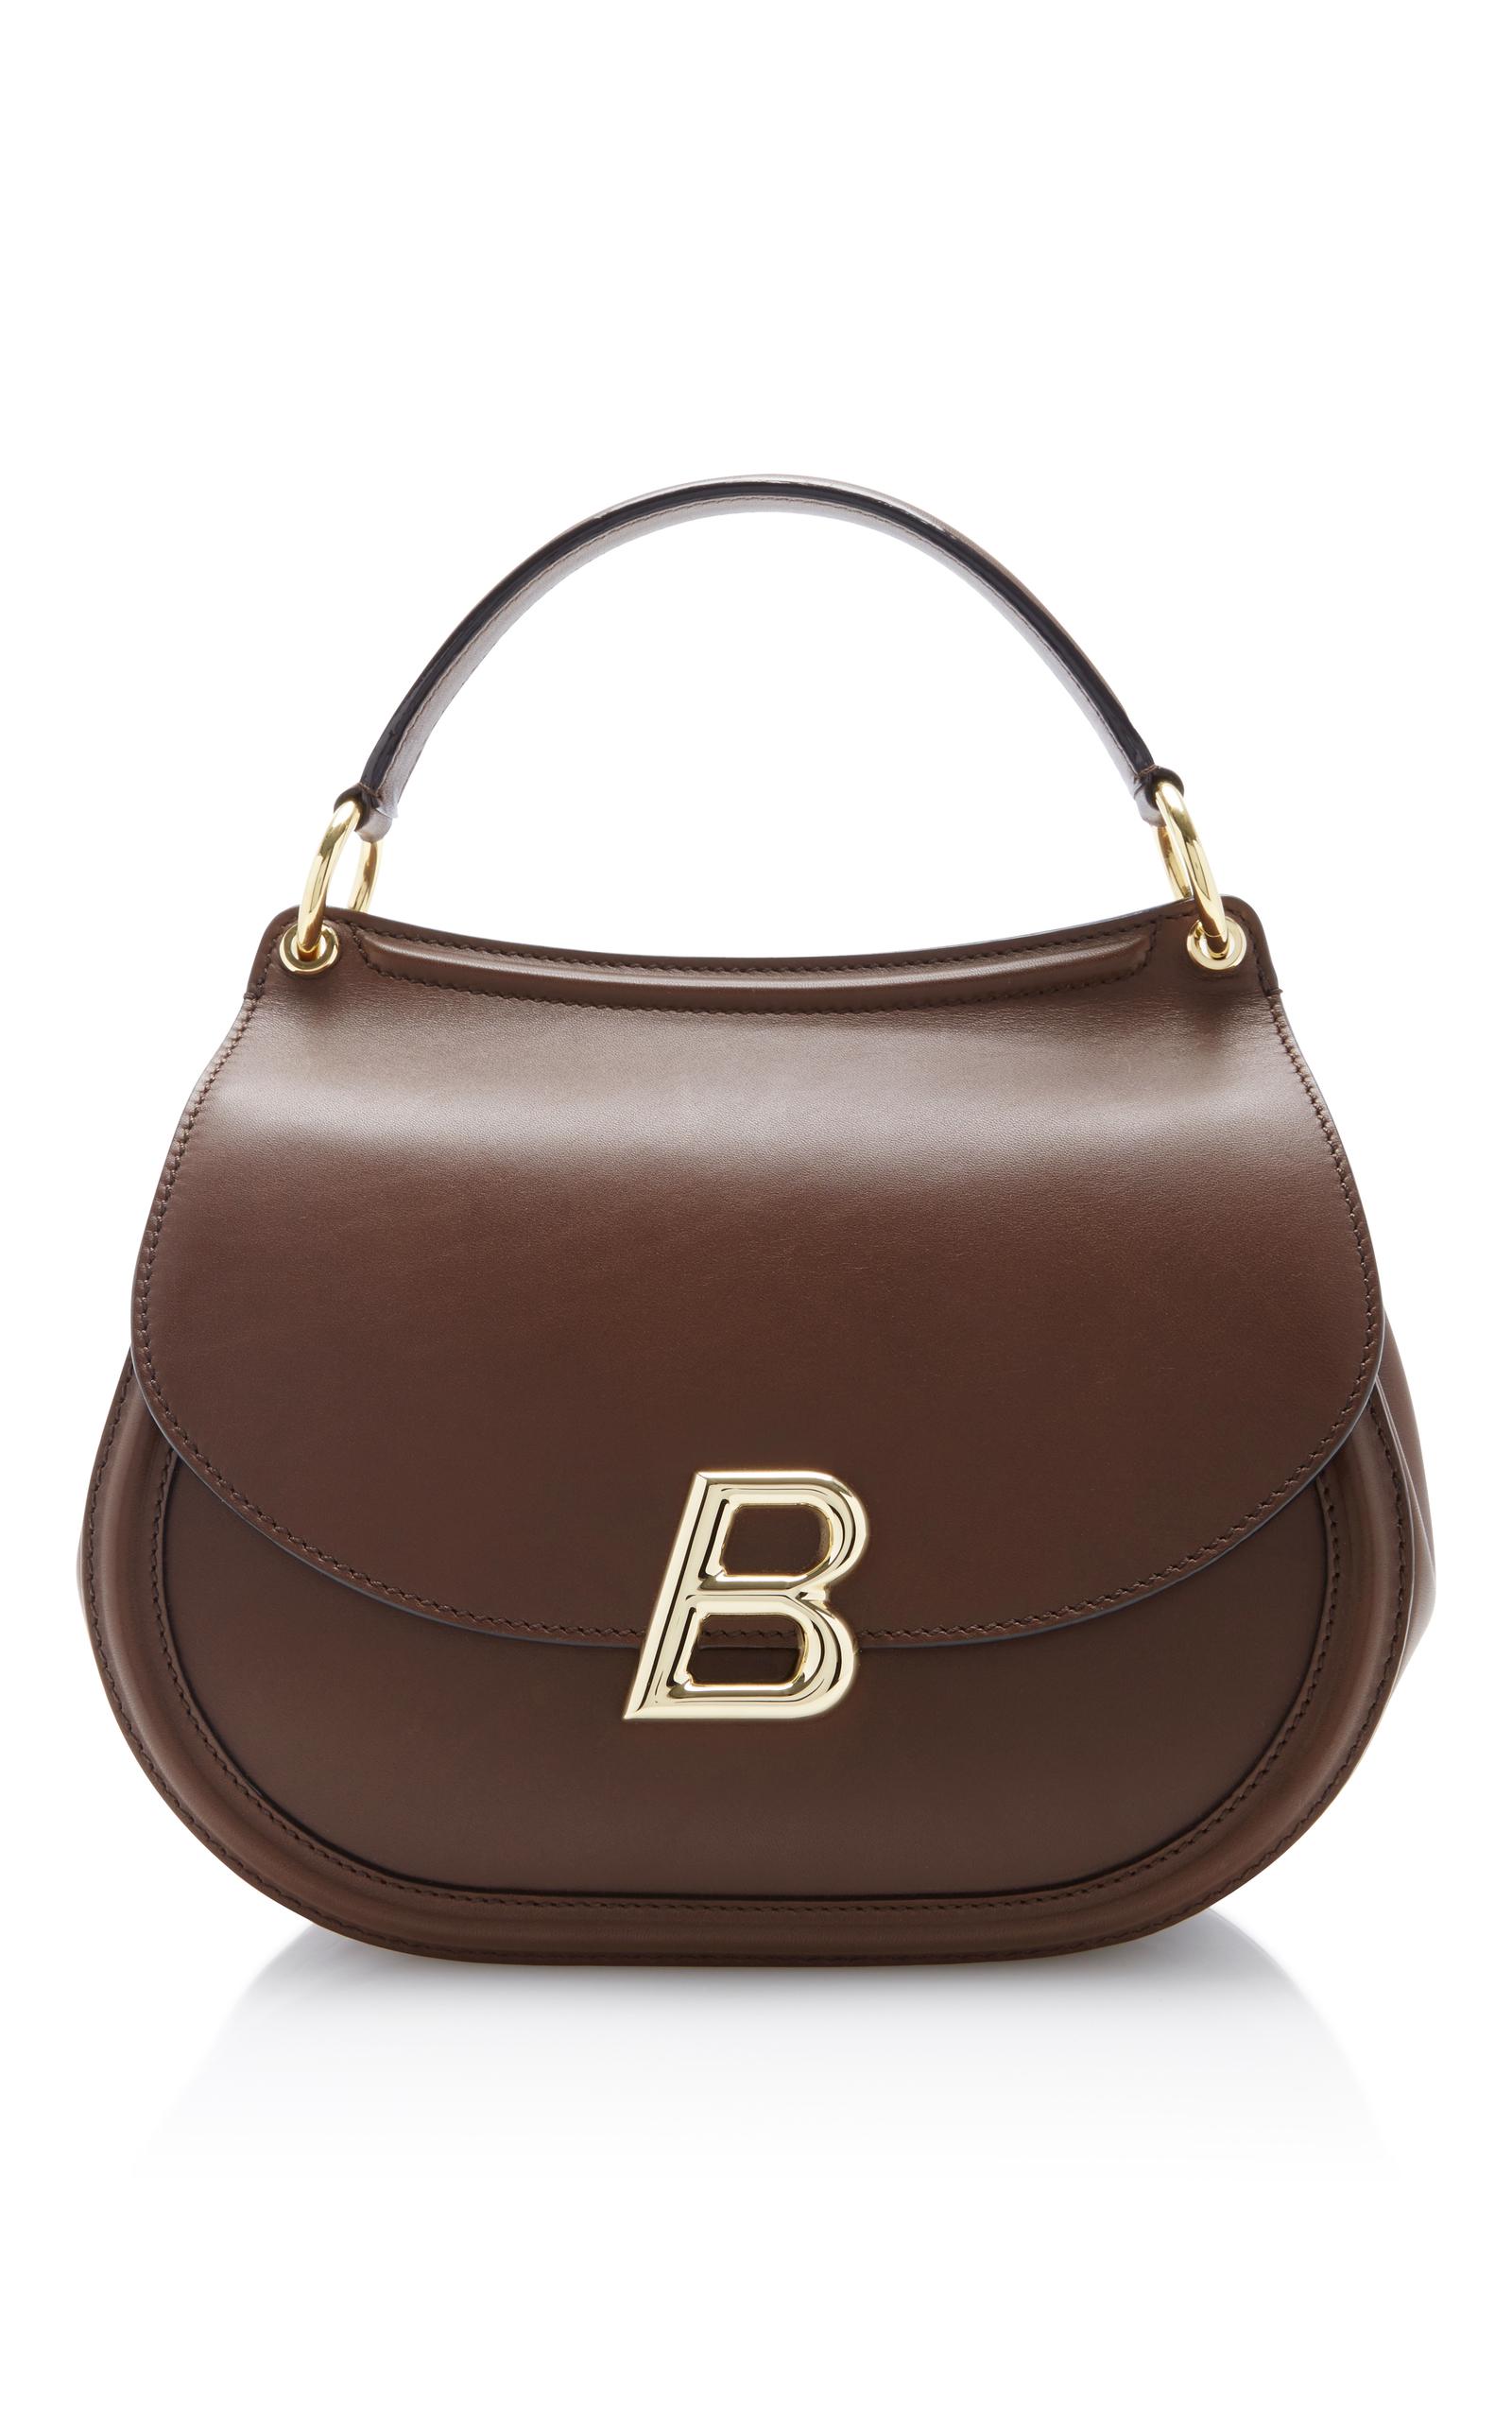 Ballyum handbag - Black Bally Online Cheapest F3WPUz